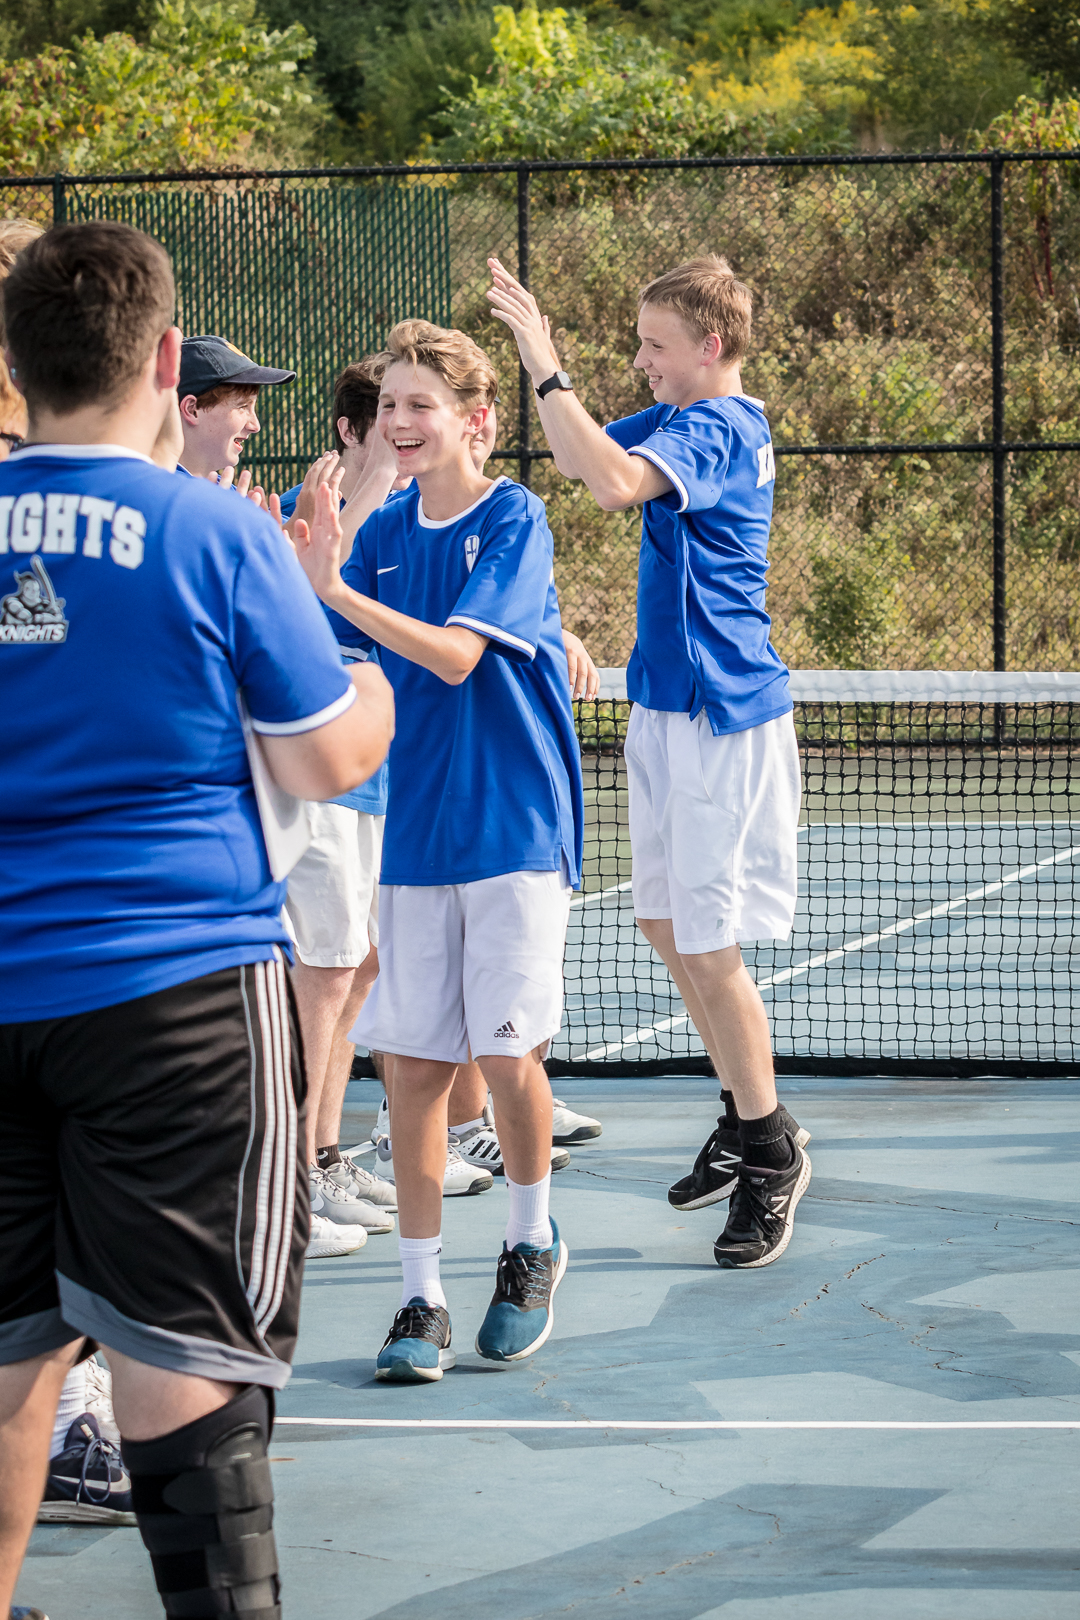 Marian-Boys-Tennis-1601.jpg